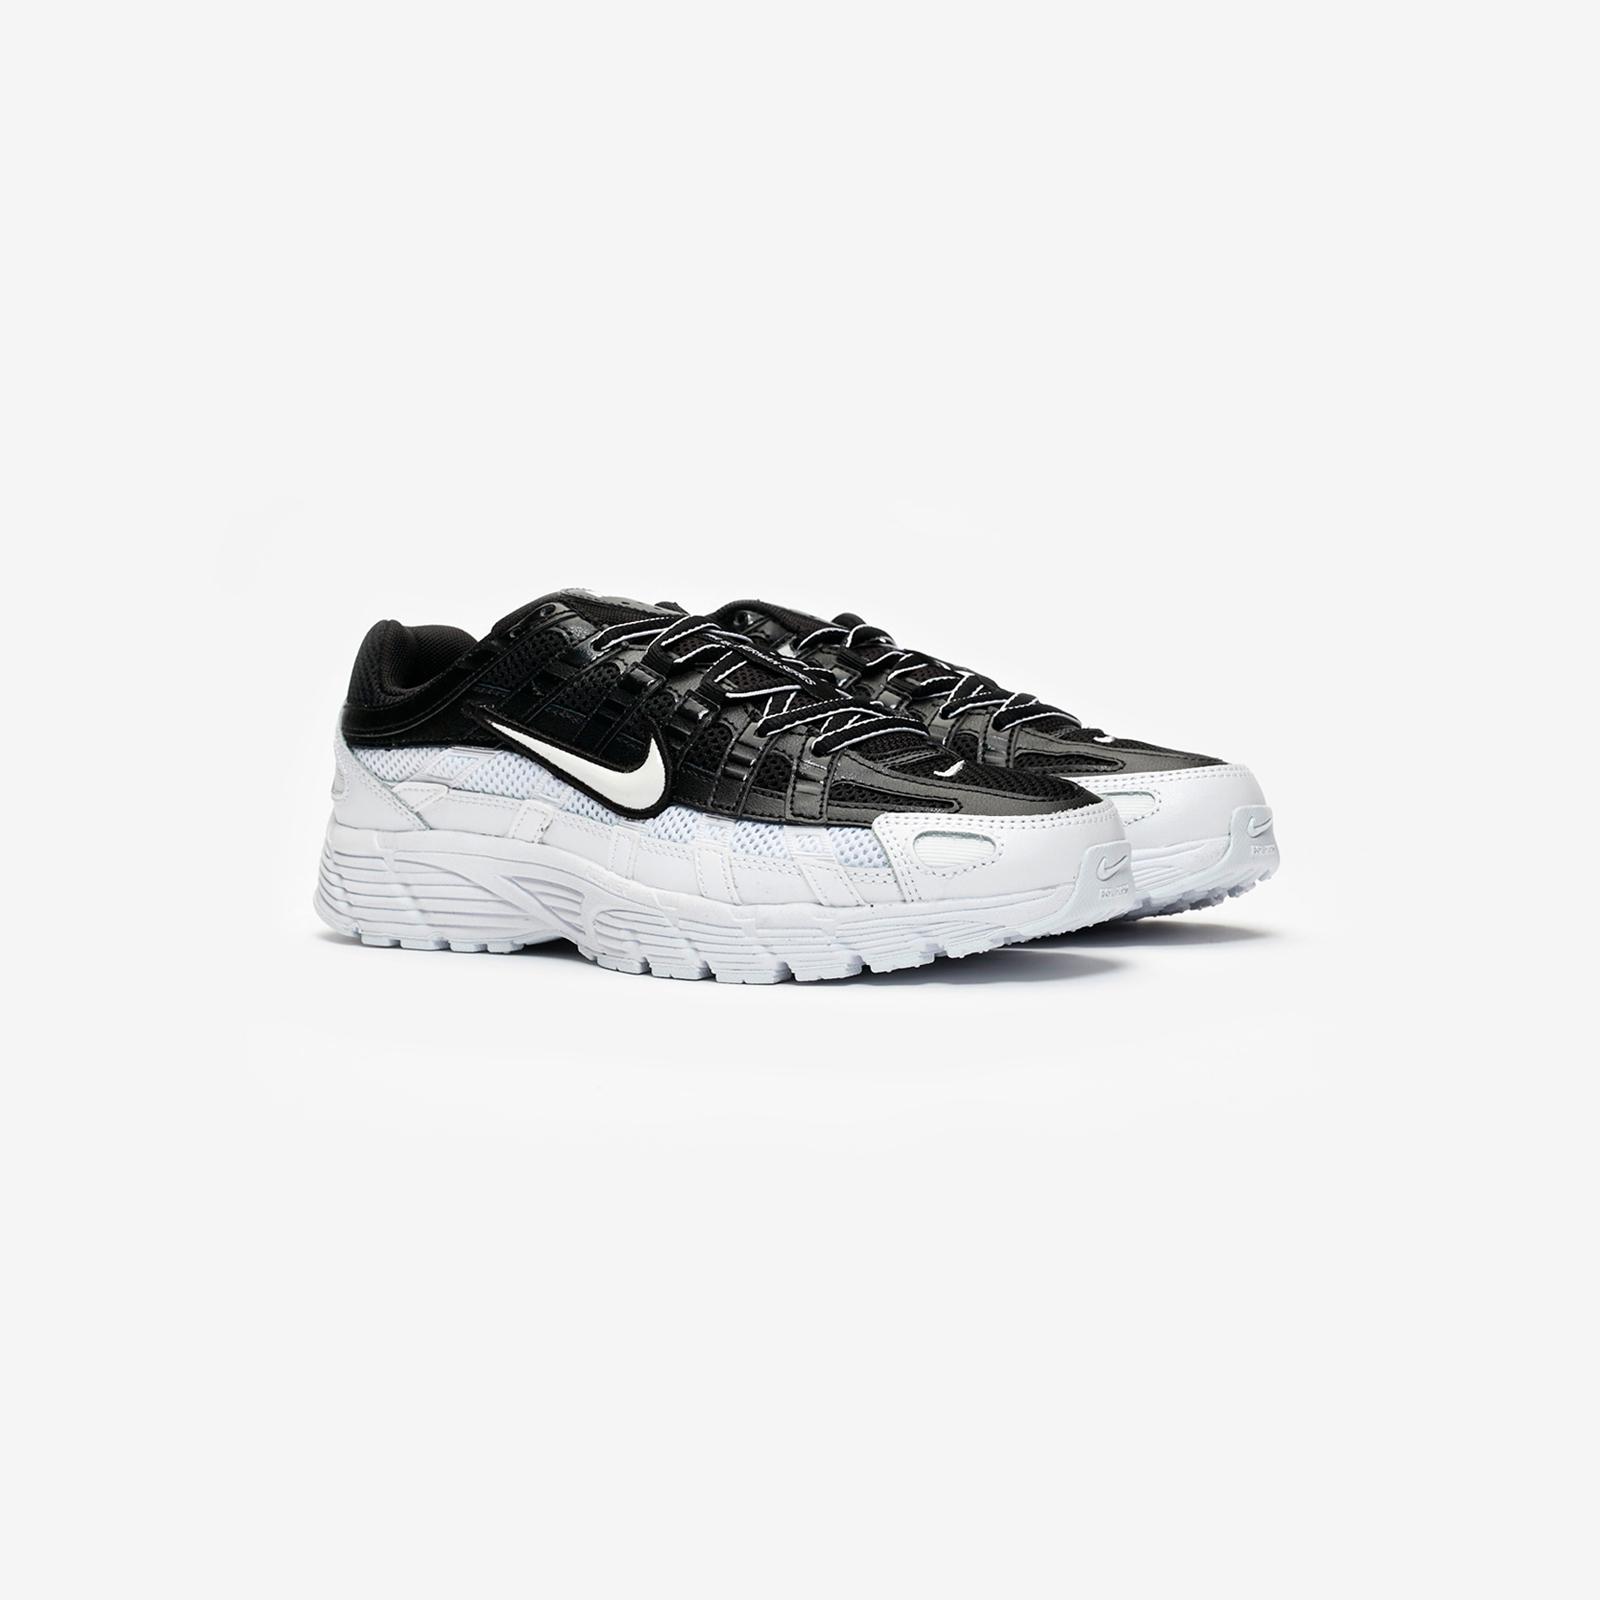 detailed look d501c e2d97 Nike Sportswear Wmns P-6000